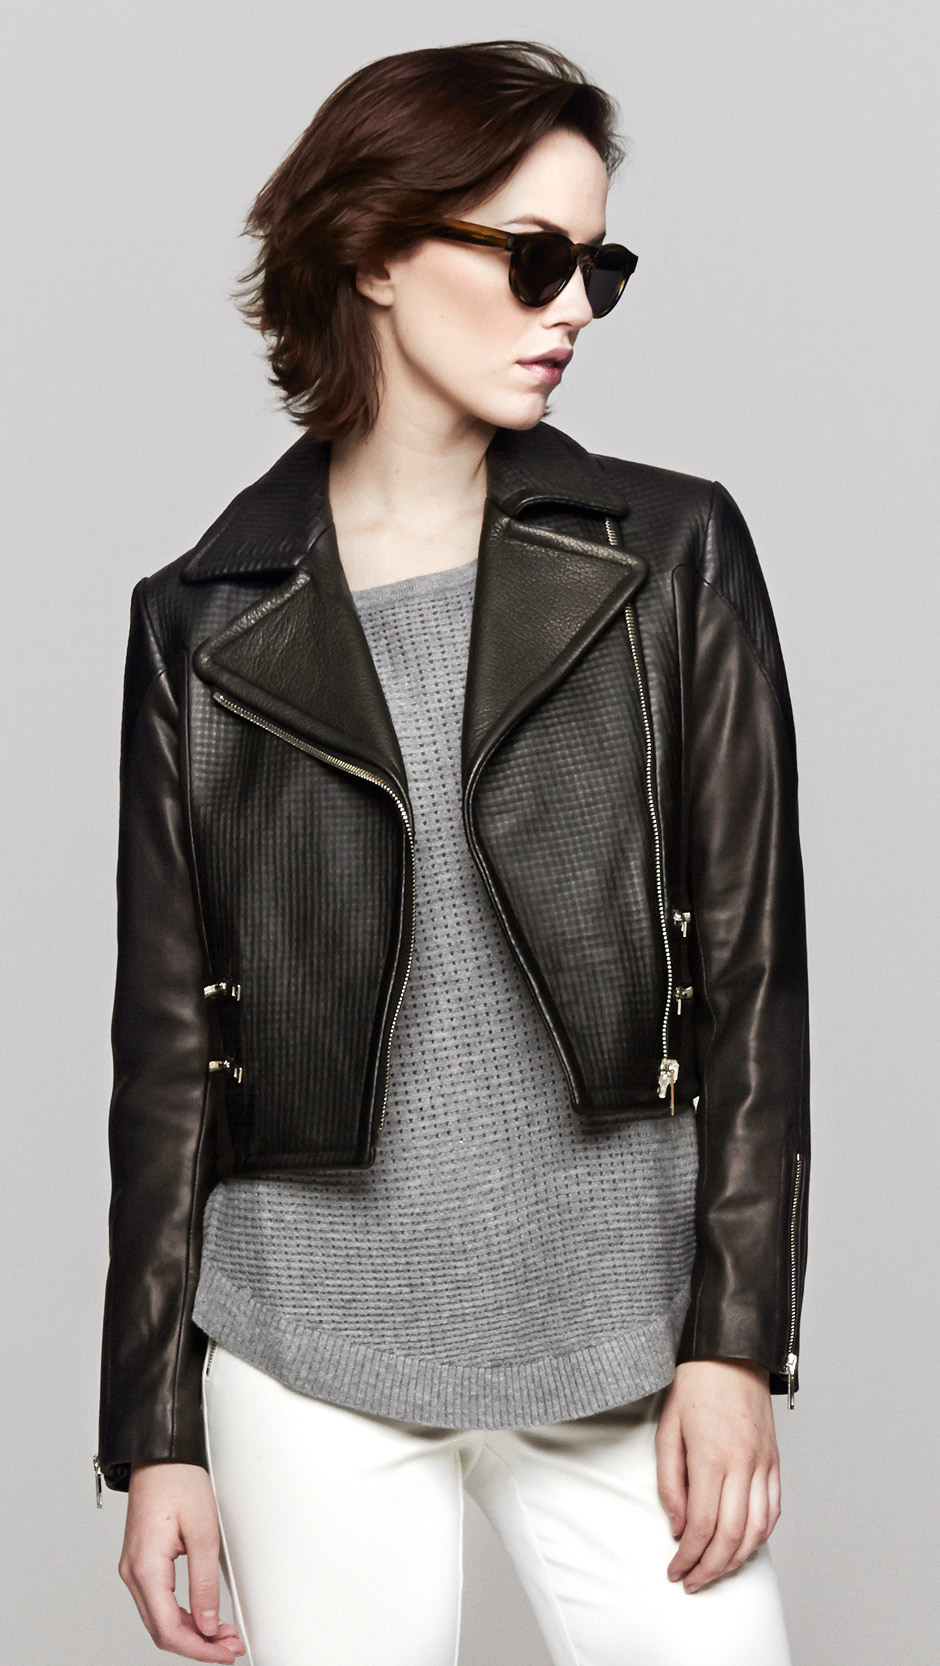 Lyst - Rag & Bone Hudson Jacket in Black